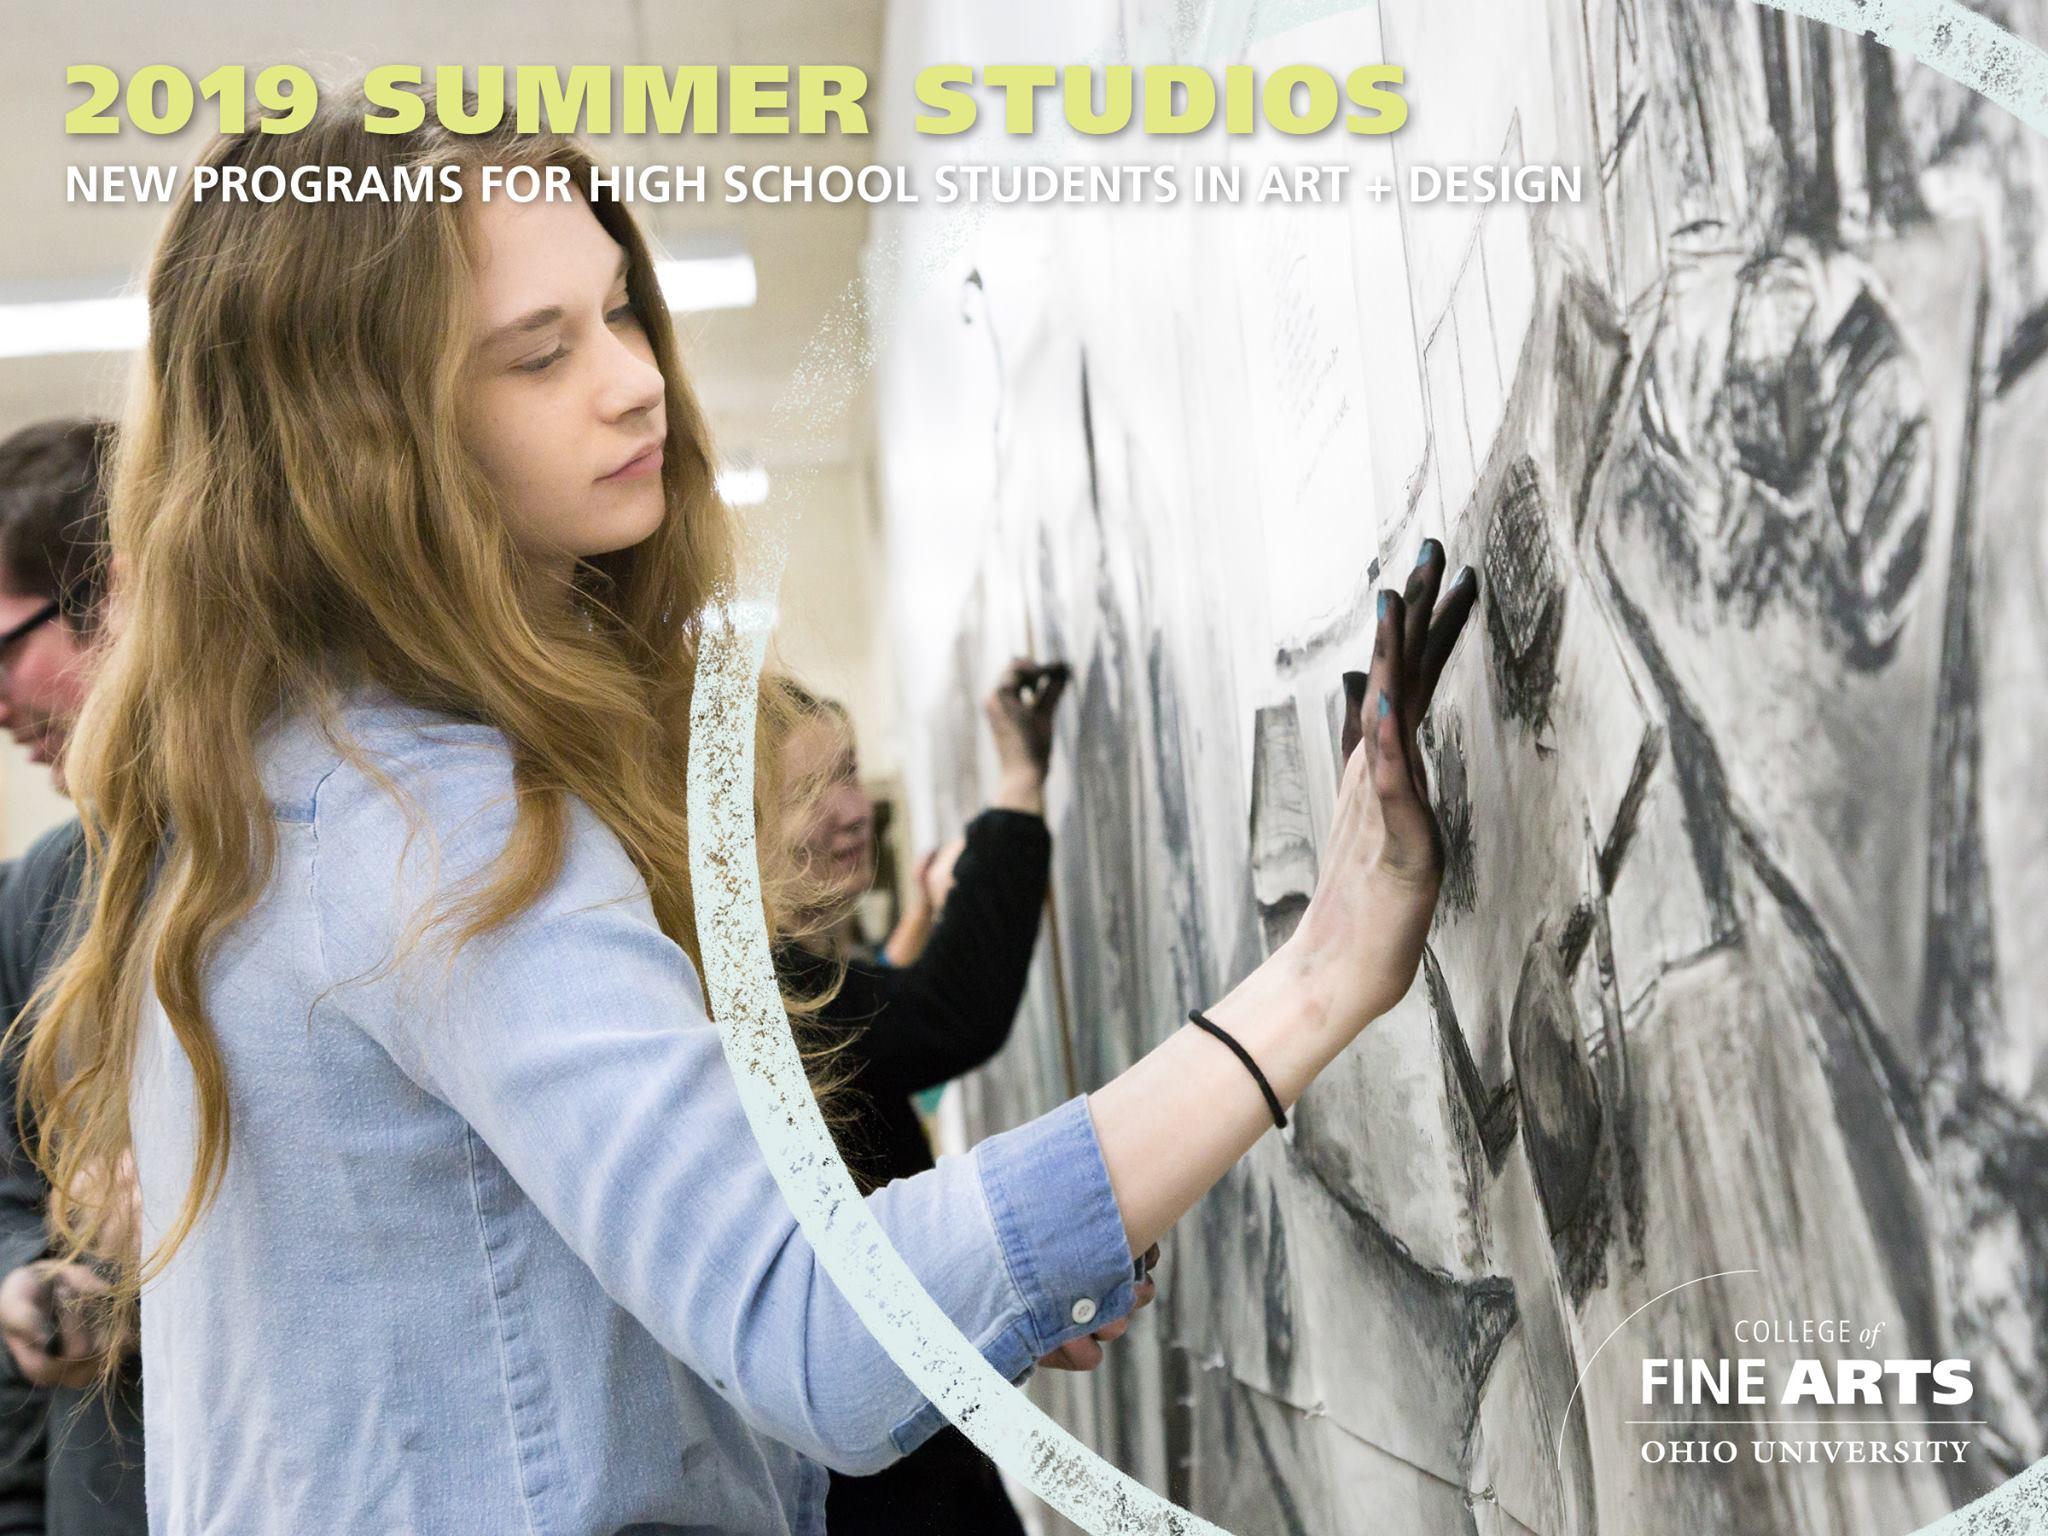 Summer Program - Fine Arts | Ohio University Summer Studio Digital Art + Fabrication